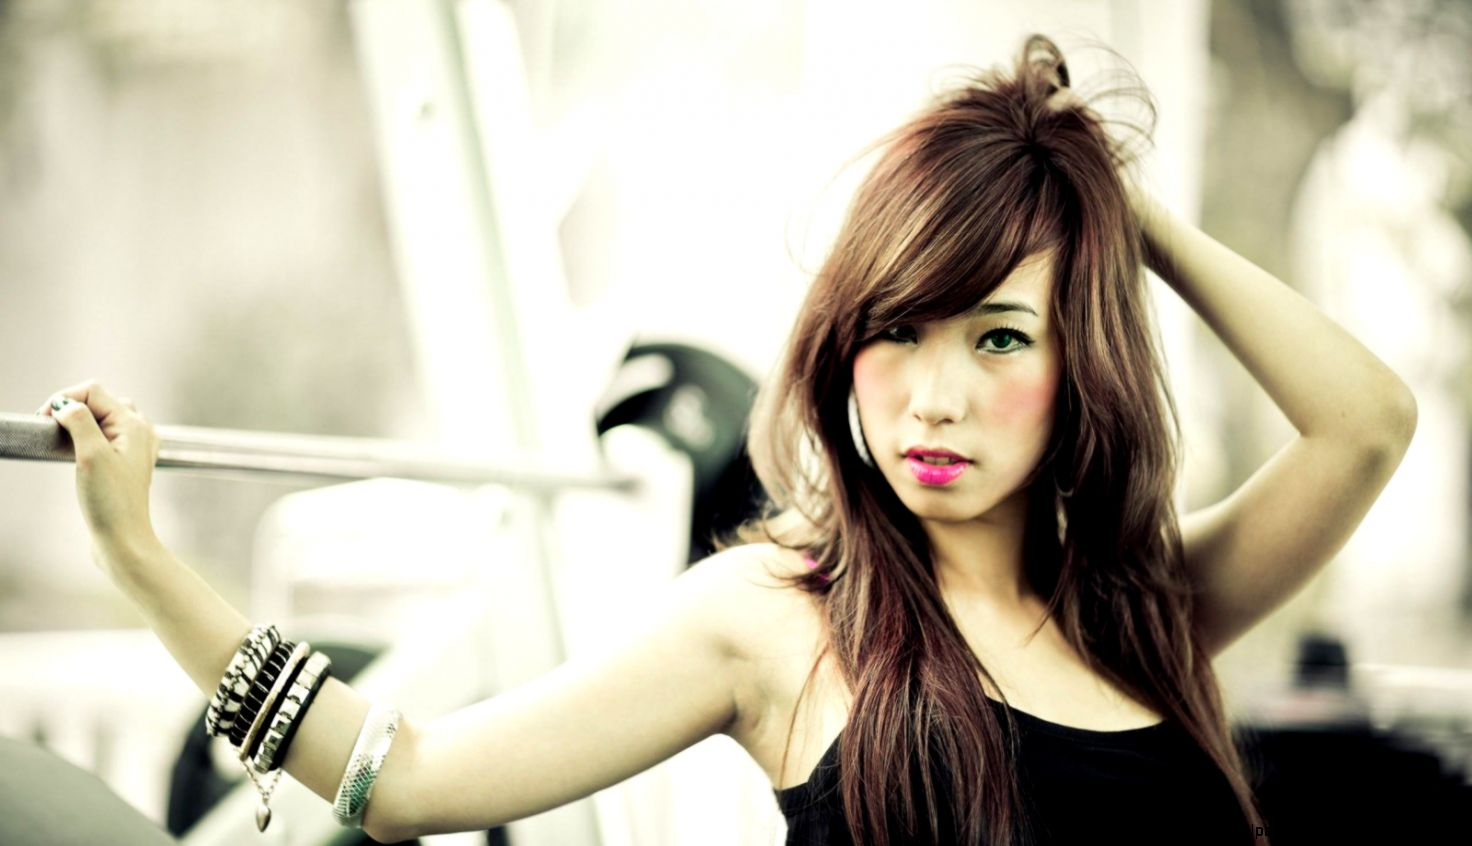 Style Portrait Asian Girl Bracelets Gym Makeup Hd Wallpaper